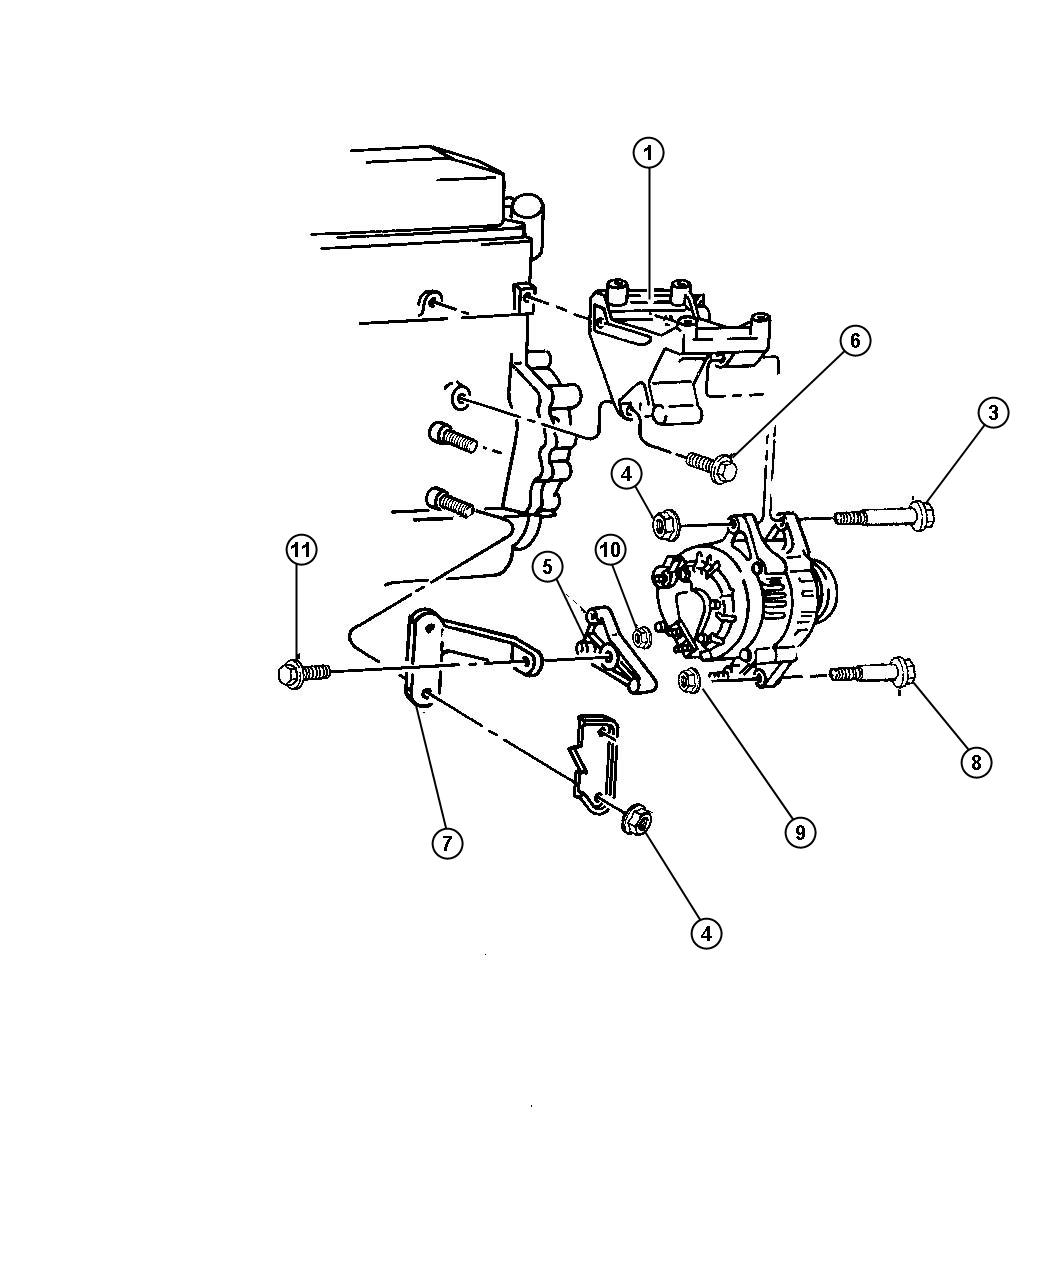 1998 Dodge Dakota Alternator Mounting 4 Cylinder Engine